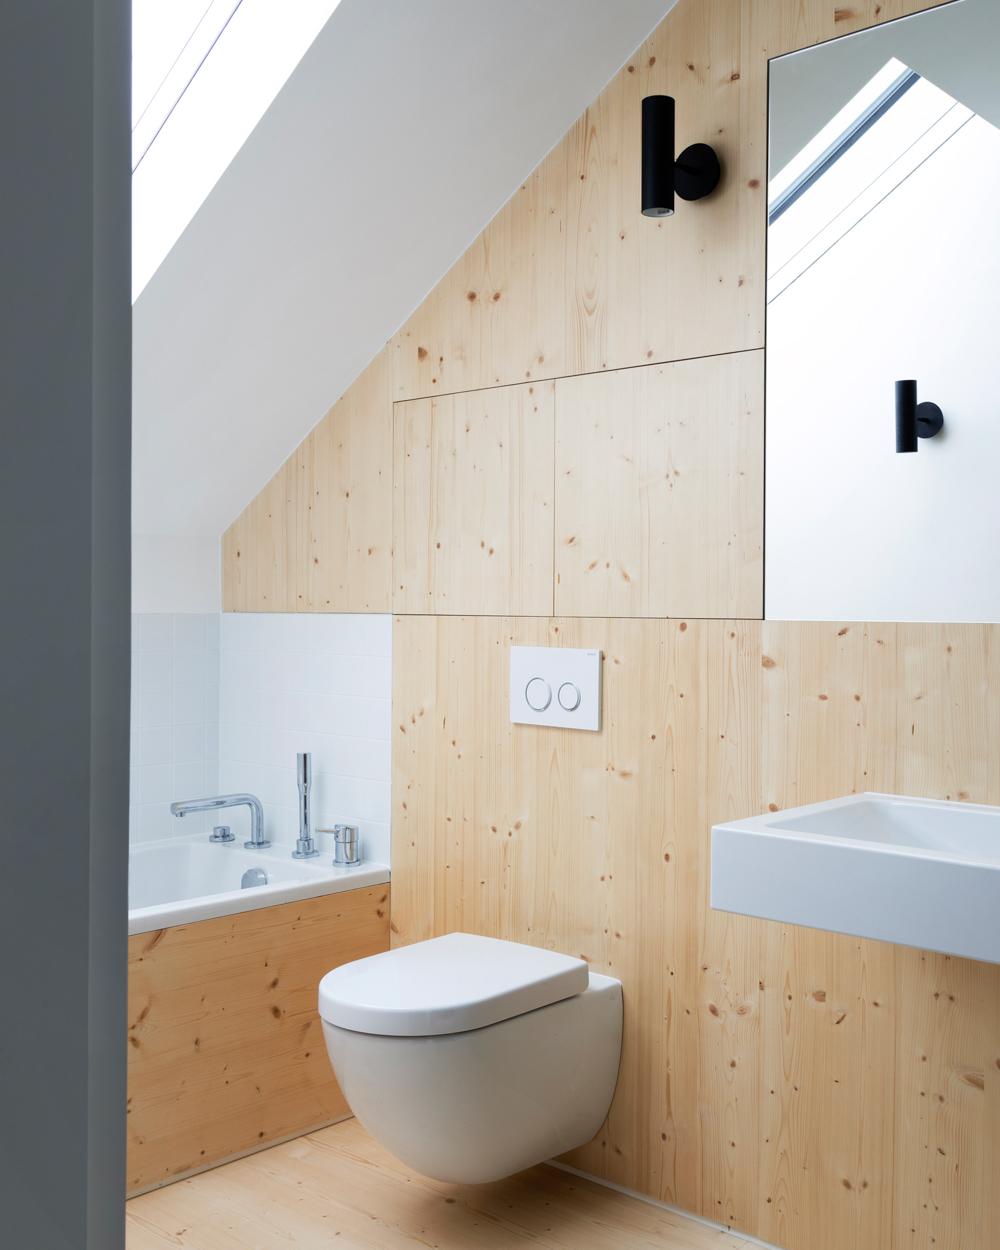 defoe-road-paper-house-project-the-design-emotive-01.jpg